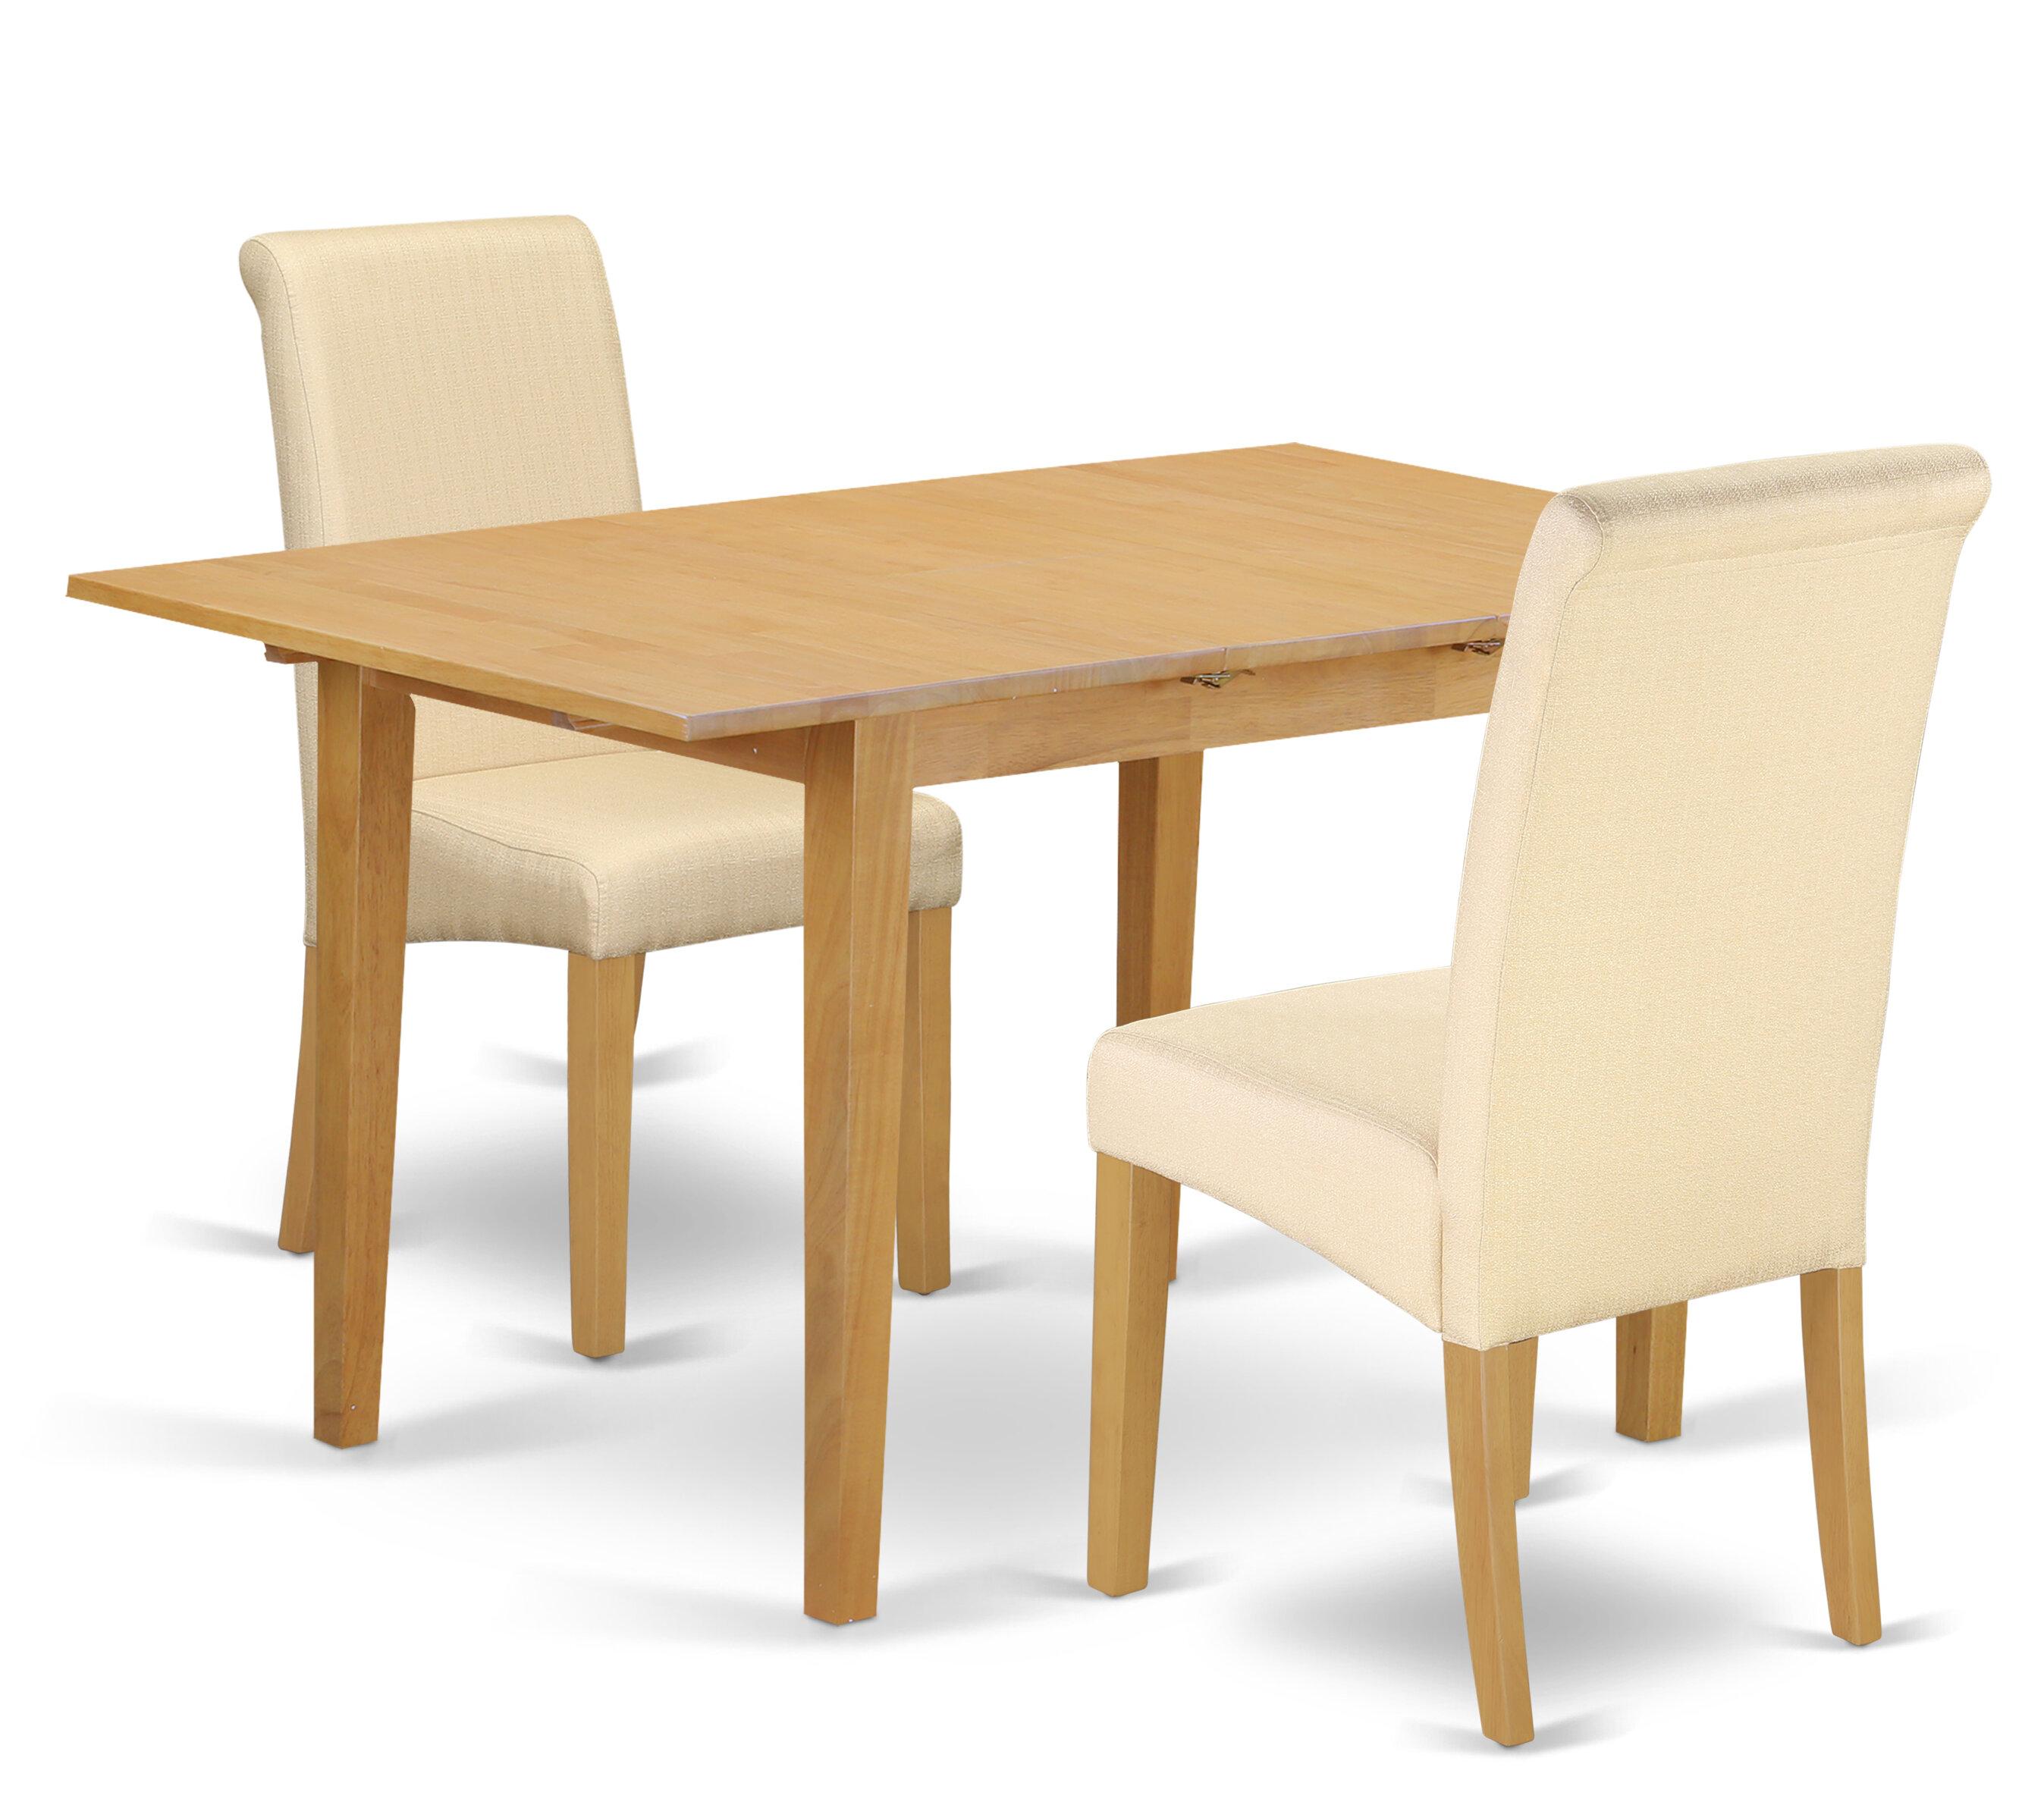 Sensational Carlie Kitchen Table 3 Piece Extendable Solid Wood Breakfast Nook Dining Set Download Free Architecture Designs Oxytwazosbritishbridgeorg